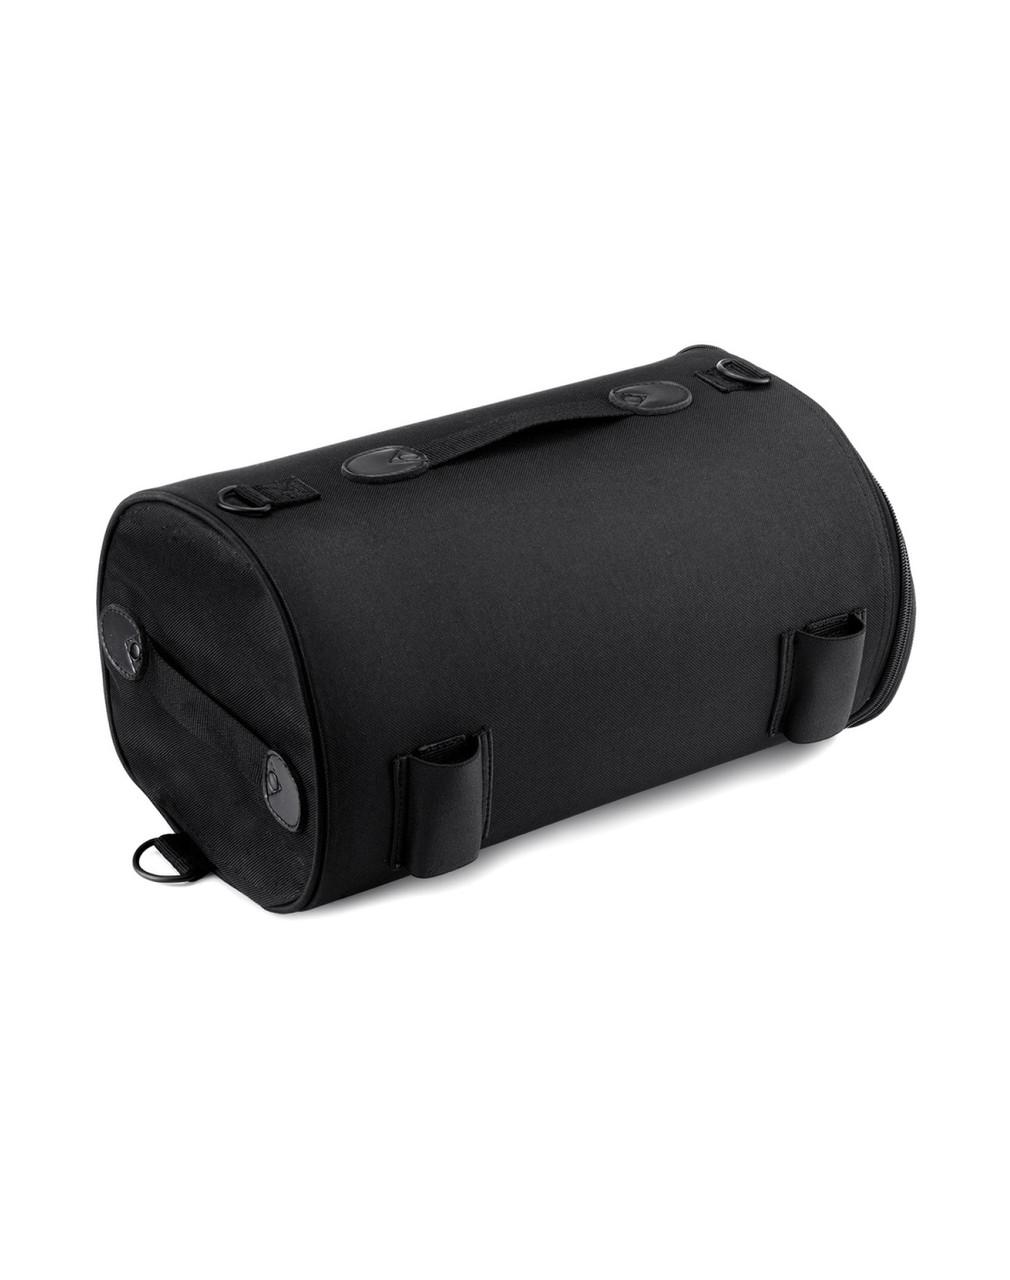 Yamaha Viking Extra Large Plain Motorcycle Tail Bag Roll Bag